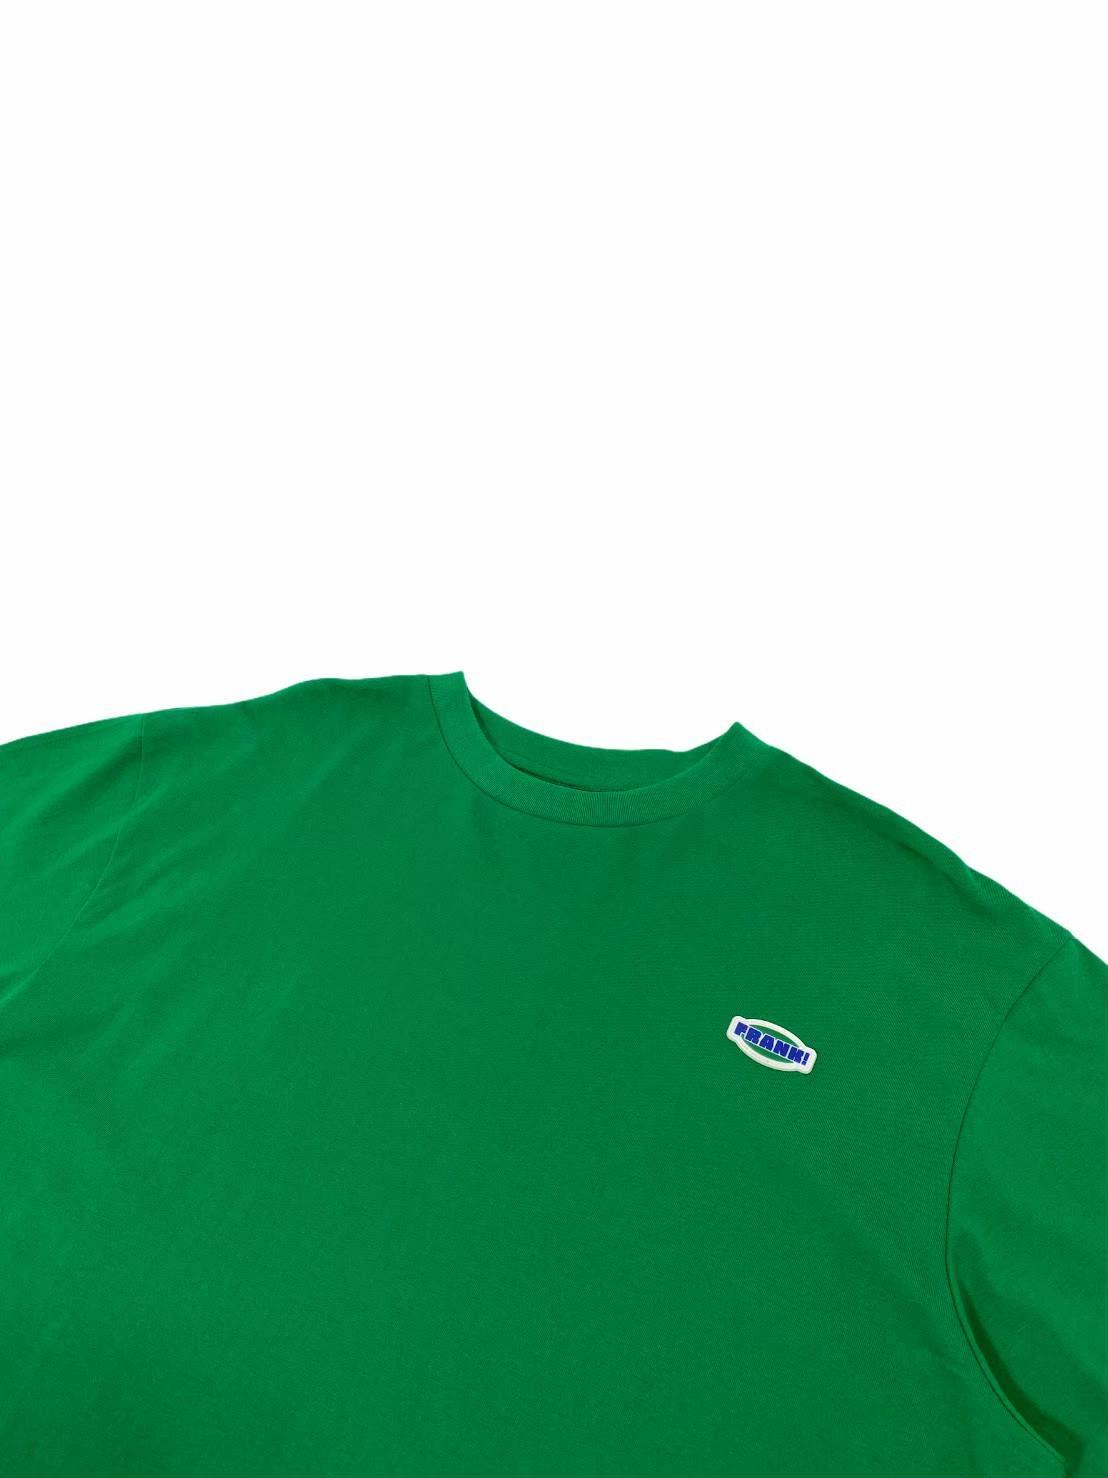 Frank Logo Tee (Green)